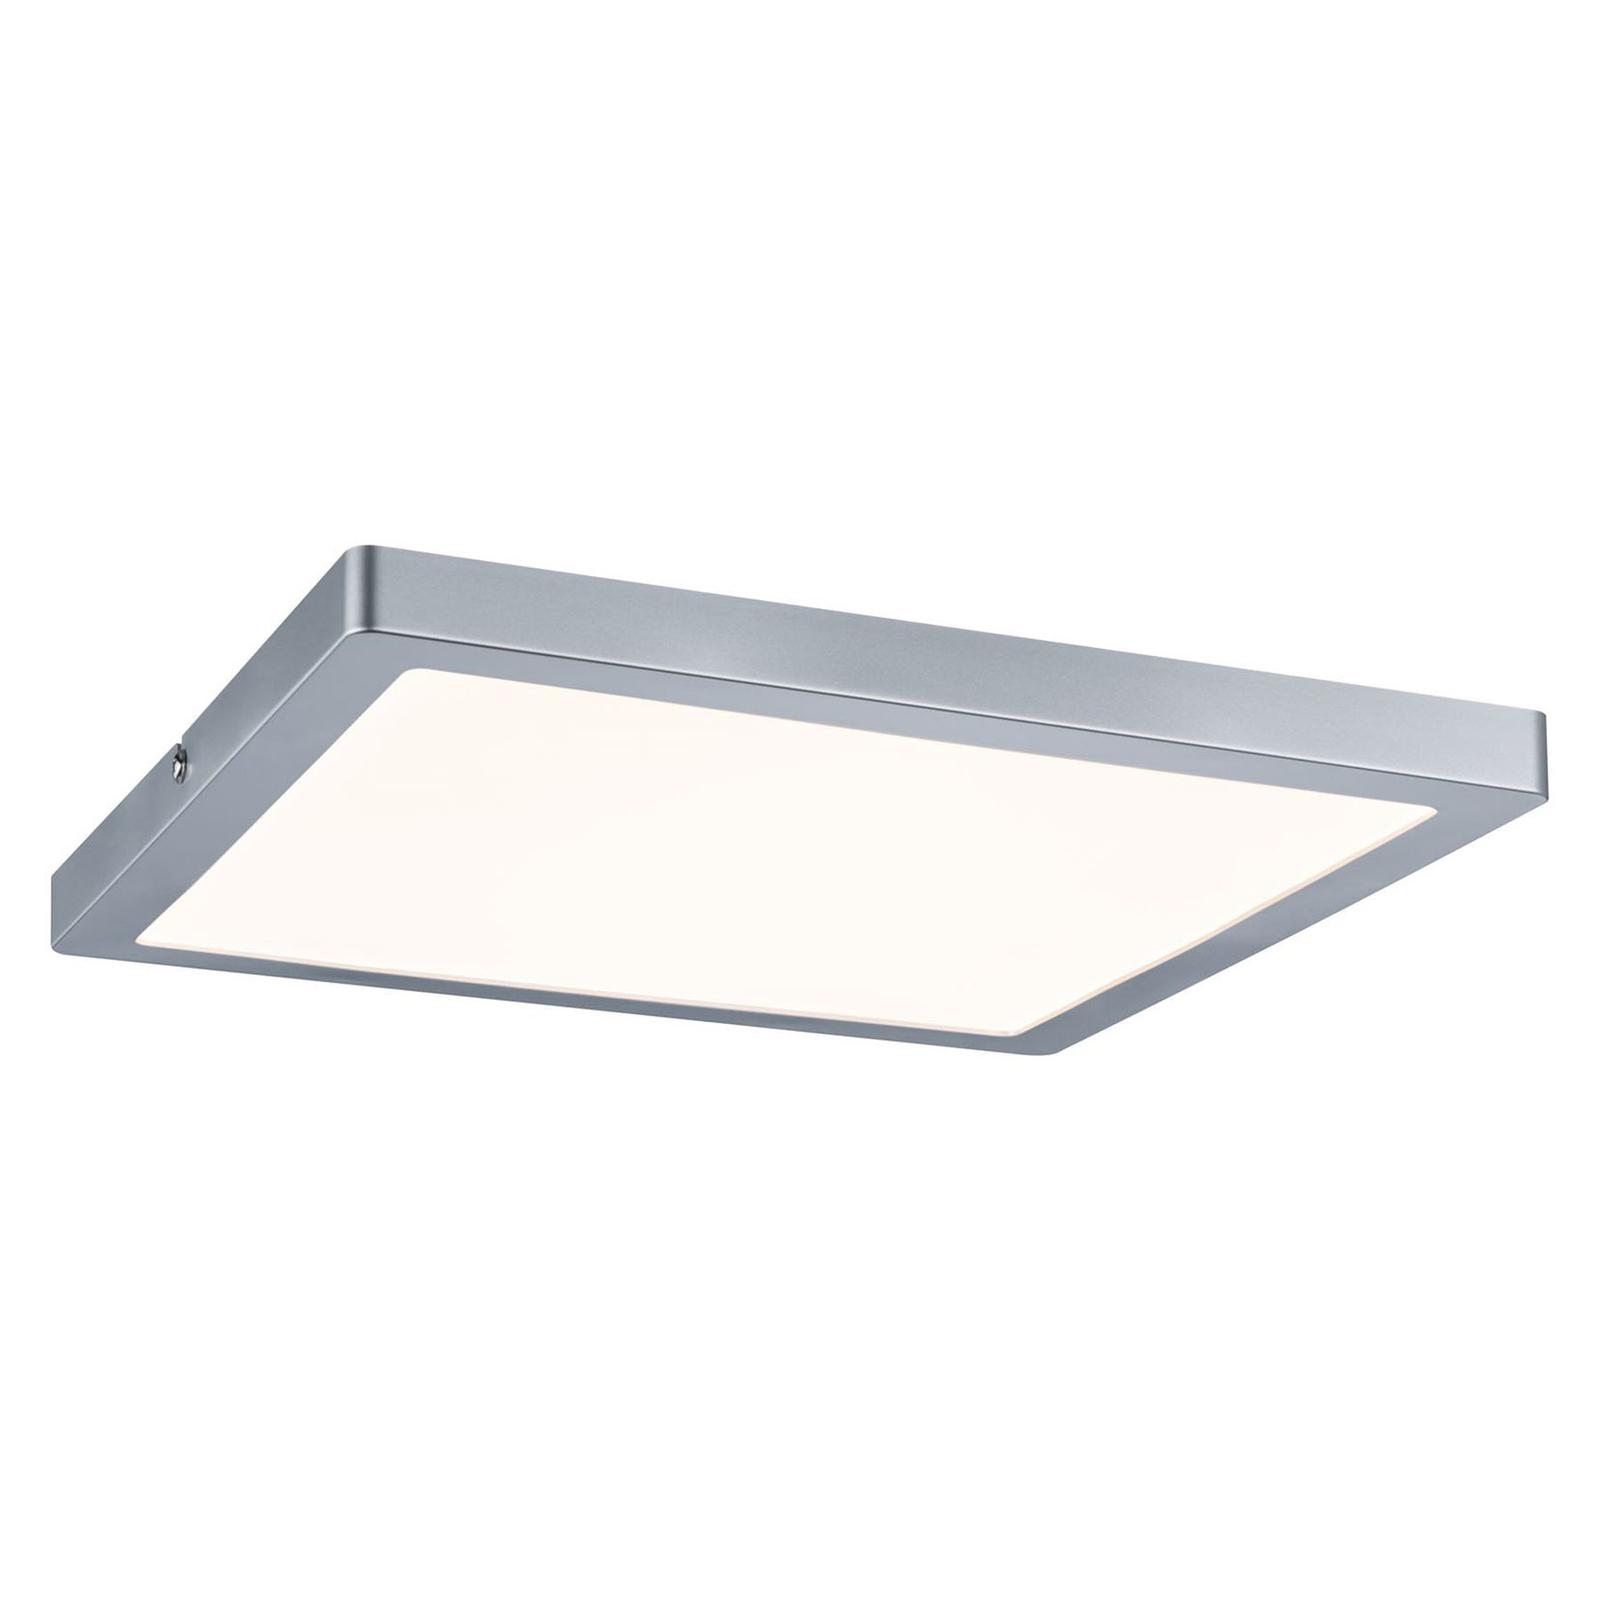 Paulmann Atria lampa sufitowa LED 30x30cm chrom